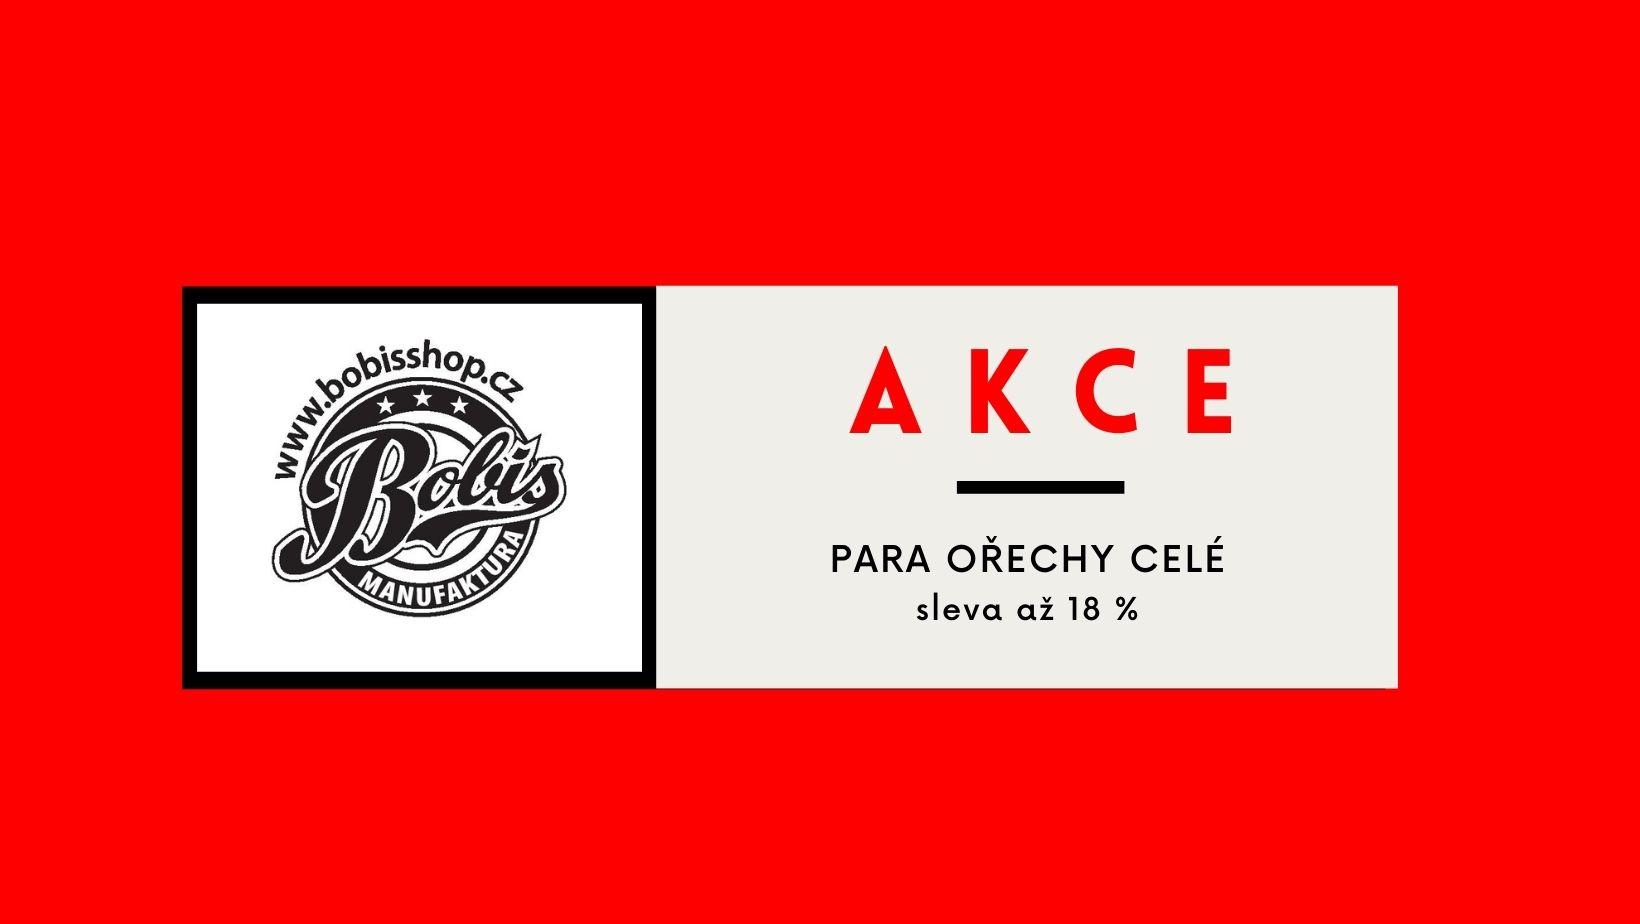 AKCE - Para ořechy